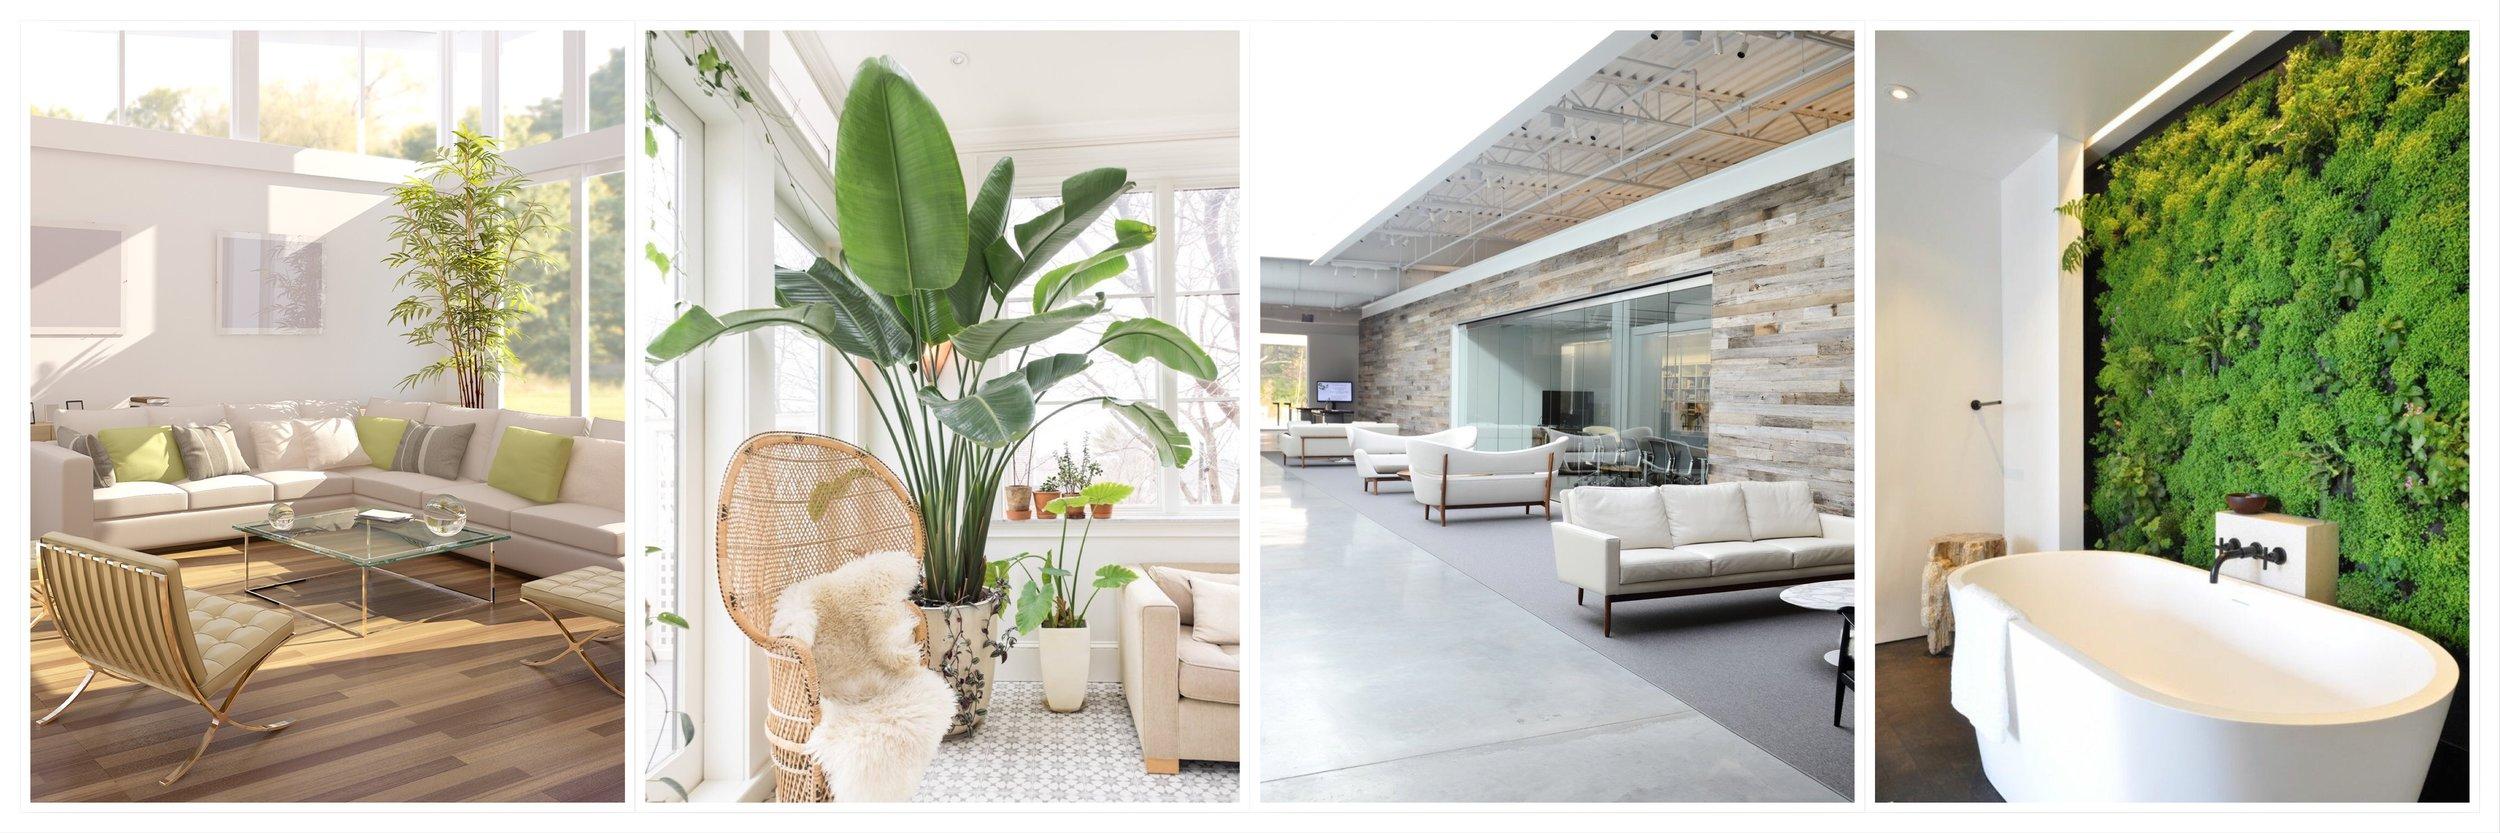 Interior Sustainable Design Panoramic Collage.JPEG